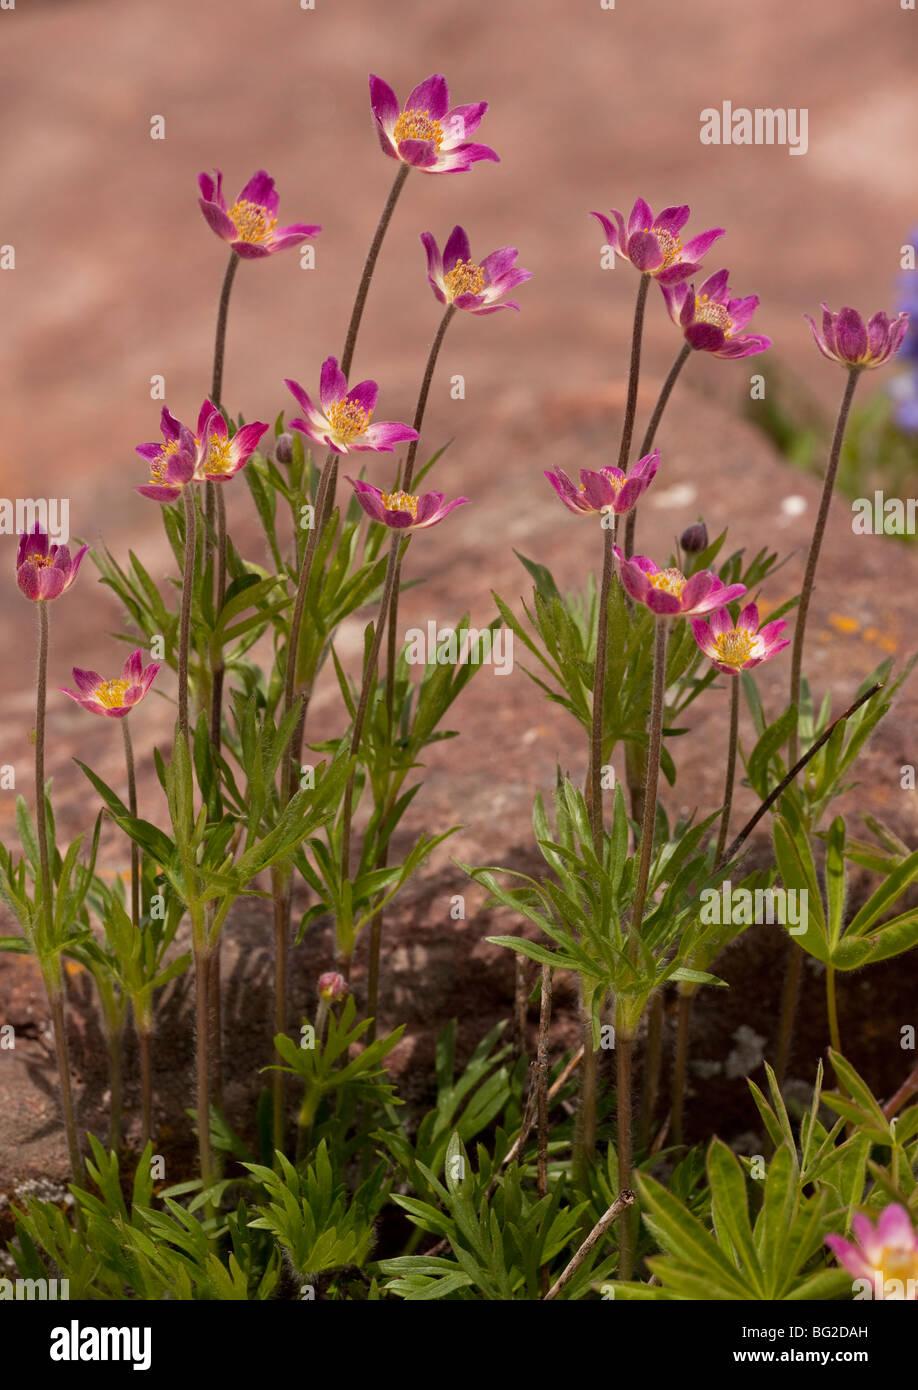 Red Anemone Windflower Stockfotos & Red Anemone Windflower Bilder ...